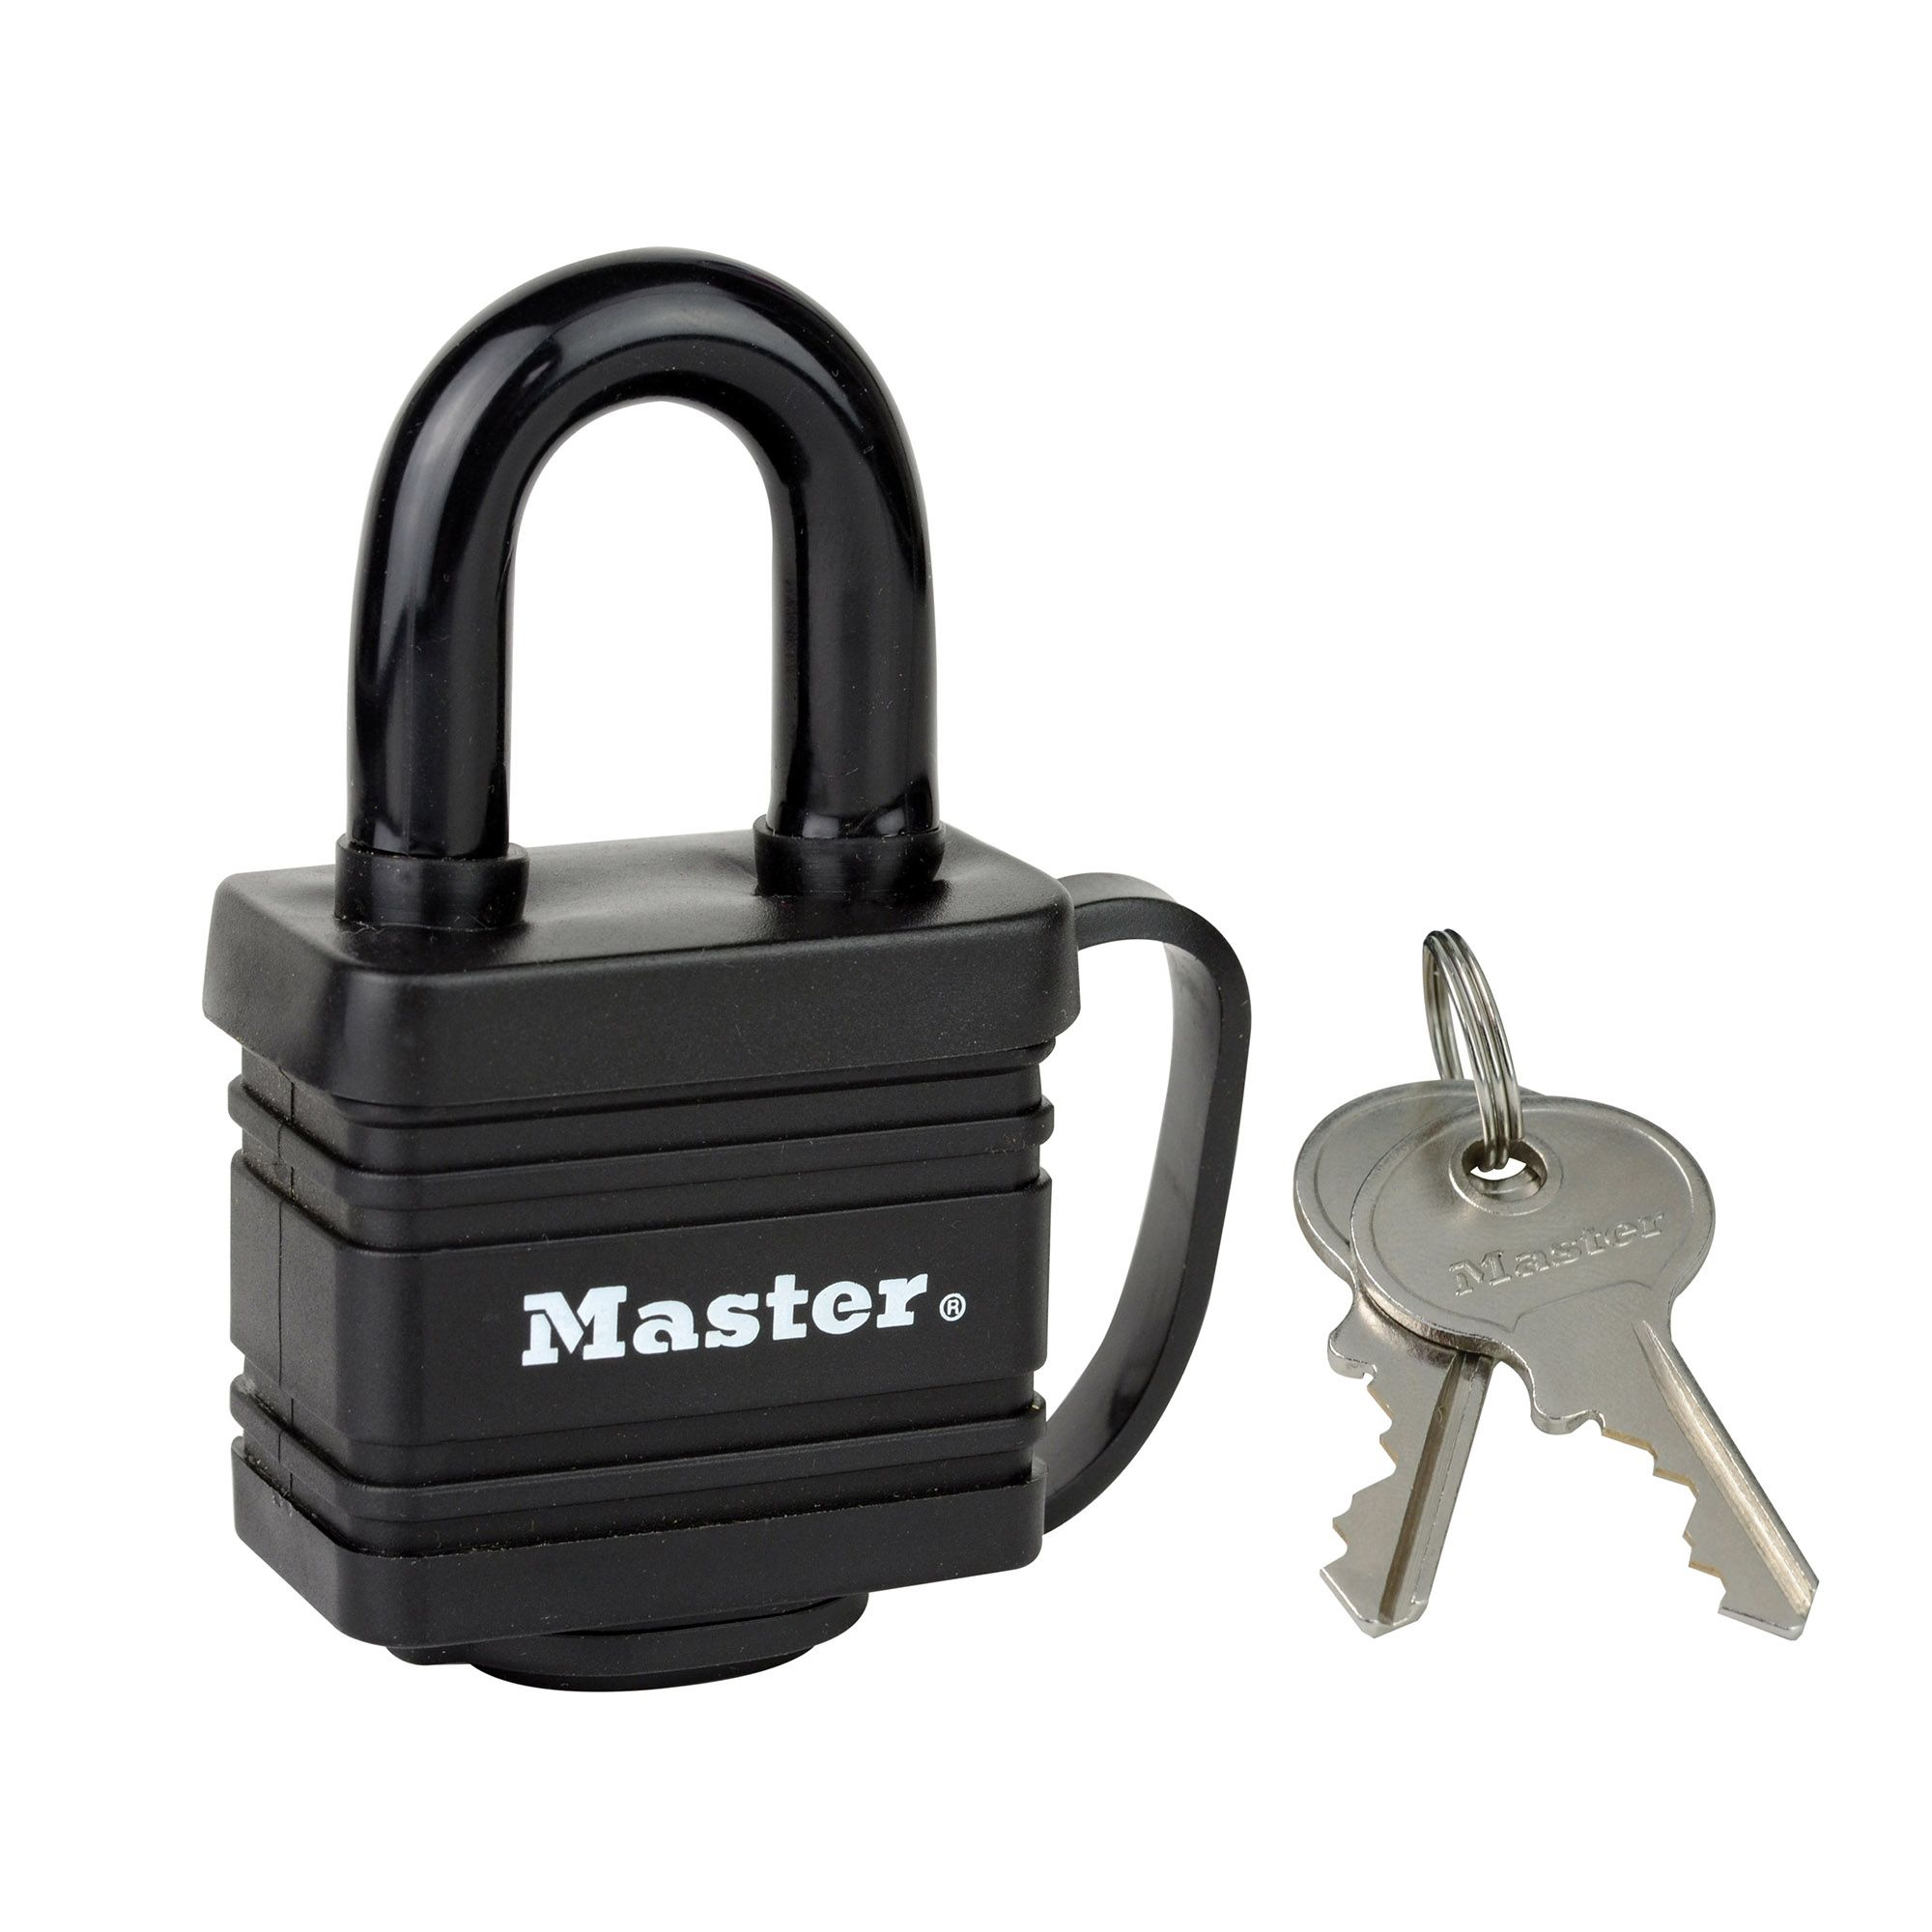 Master Lock Weather Tough Laminated Steel Keyed Hardened Steel Padlock (w)40mm